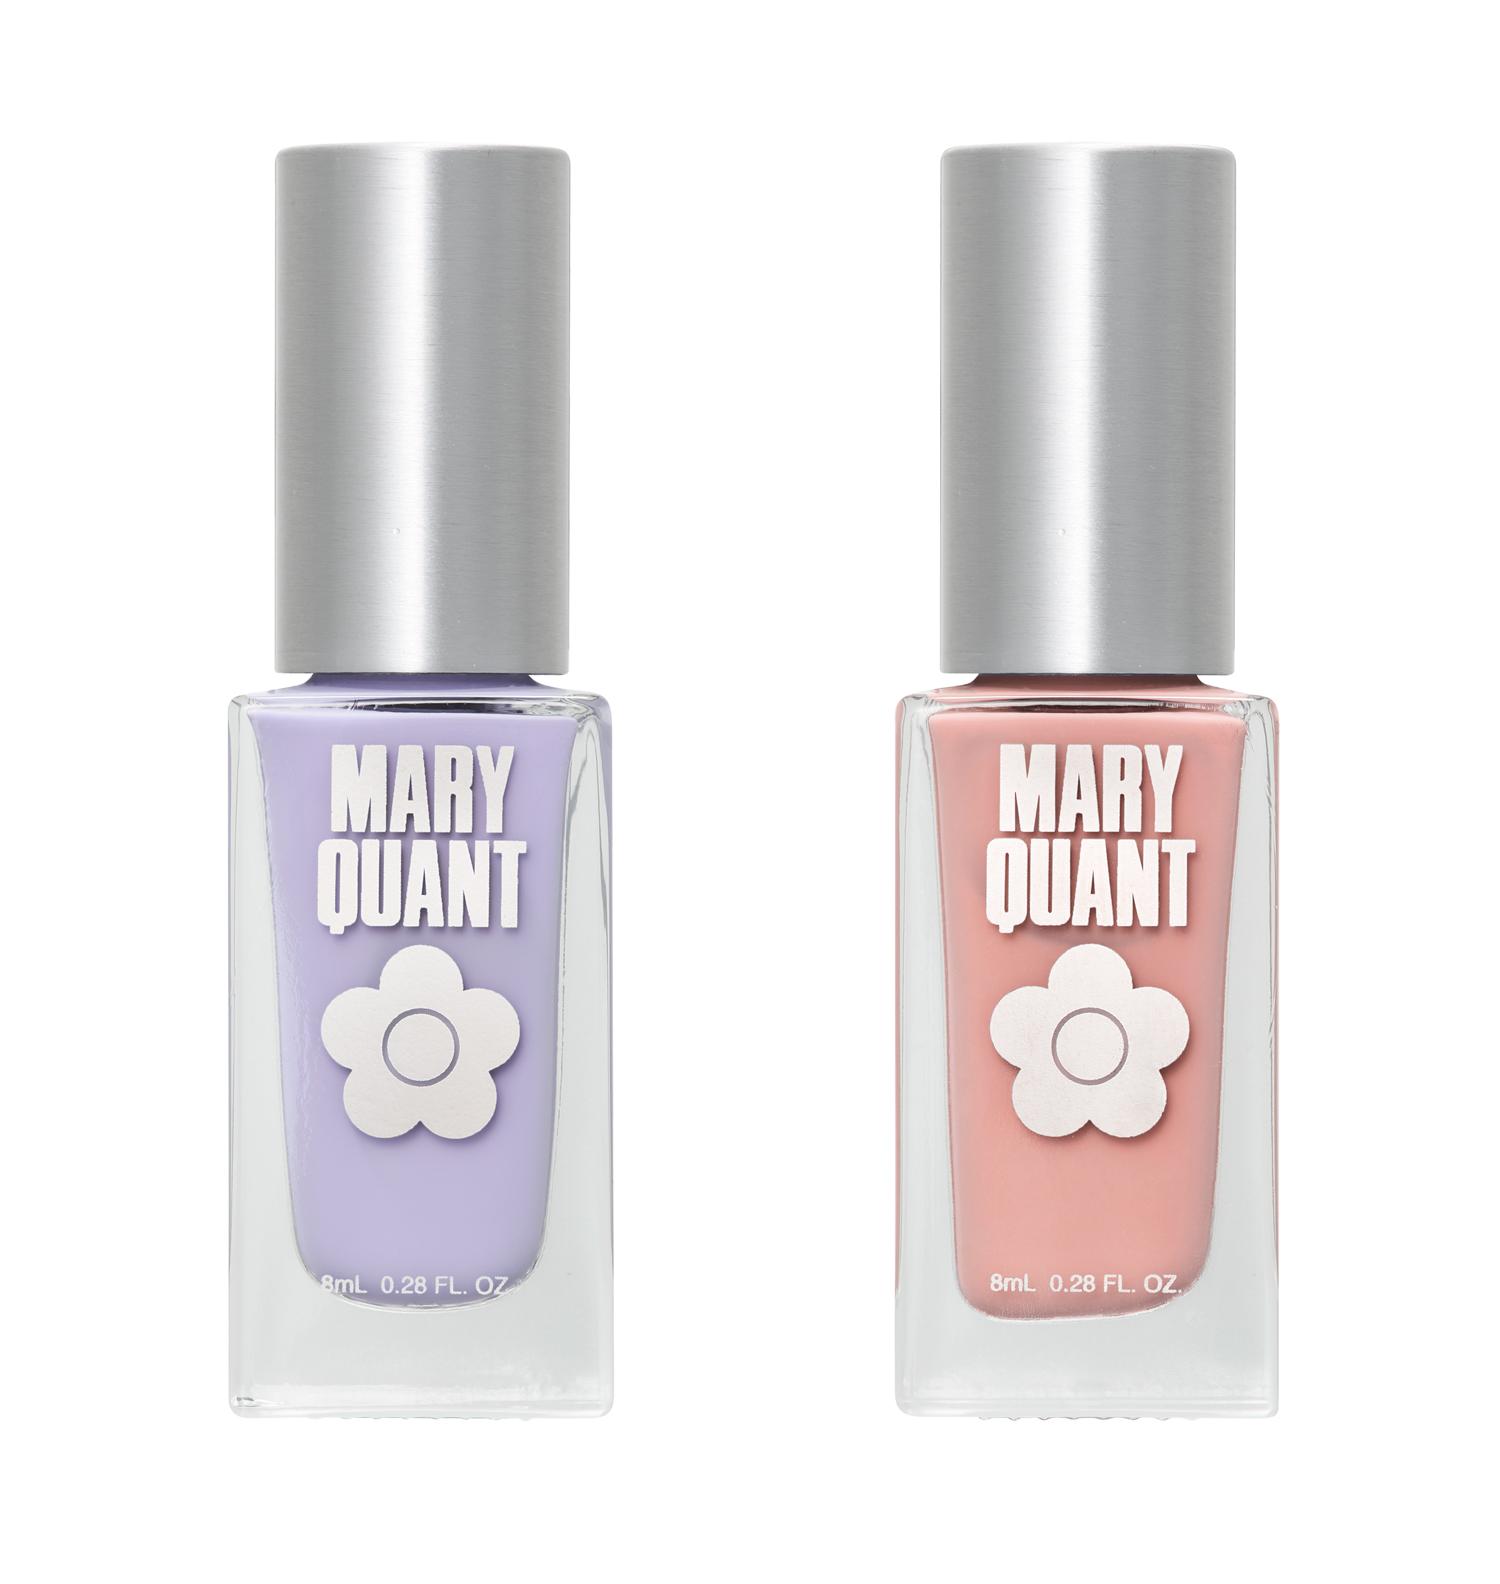 MARY-QUANT_springcolours_nailpolishネイルポリッシュ 新2色 各1,500円(税抜)